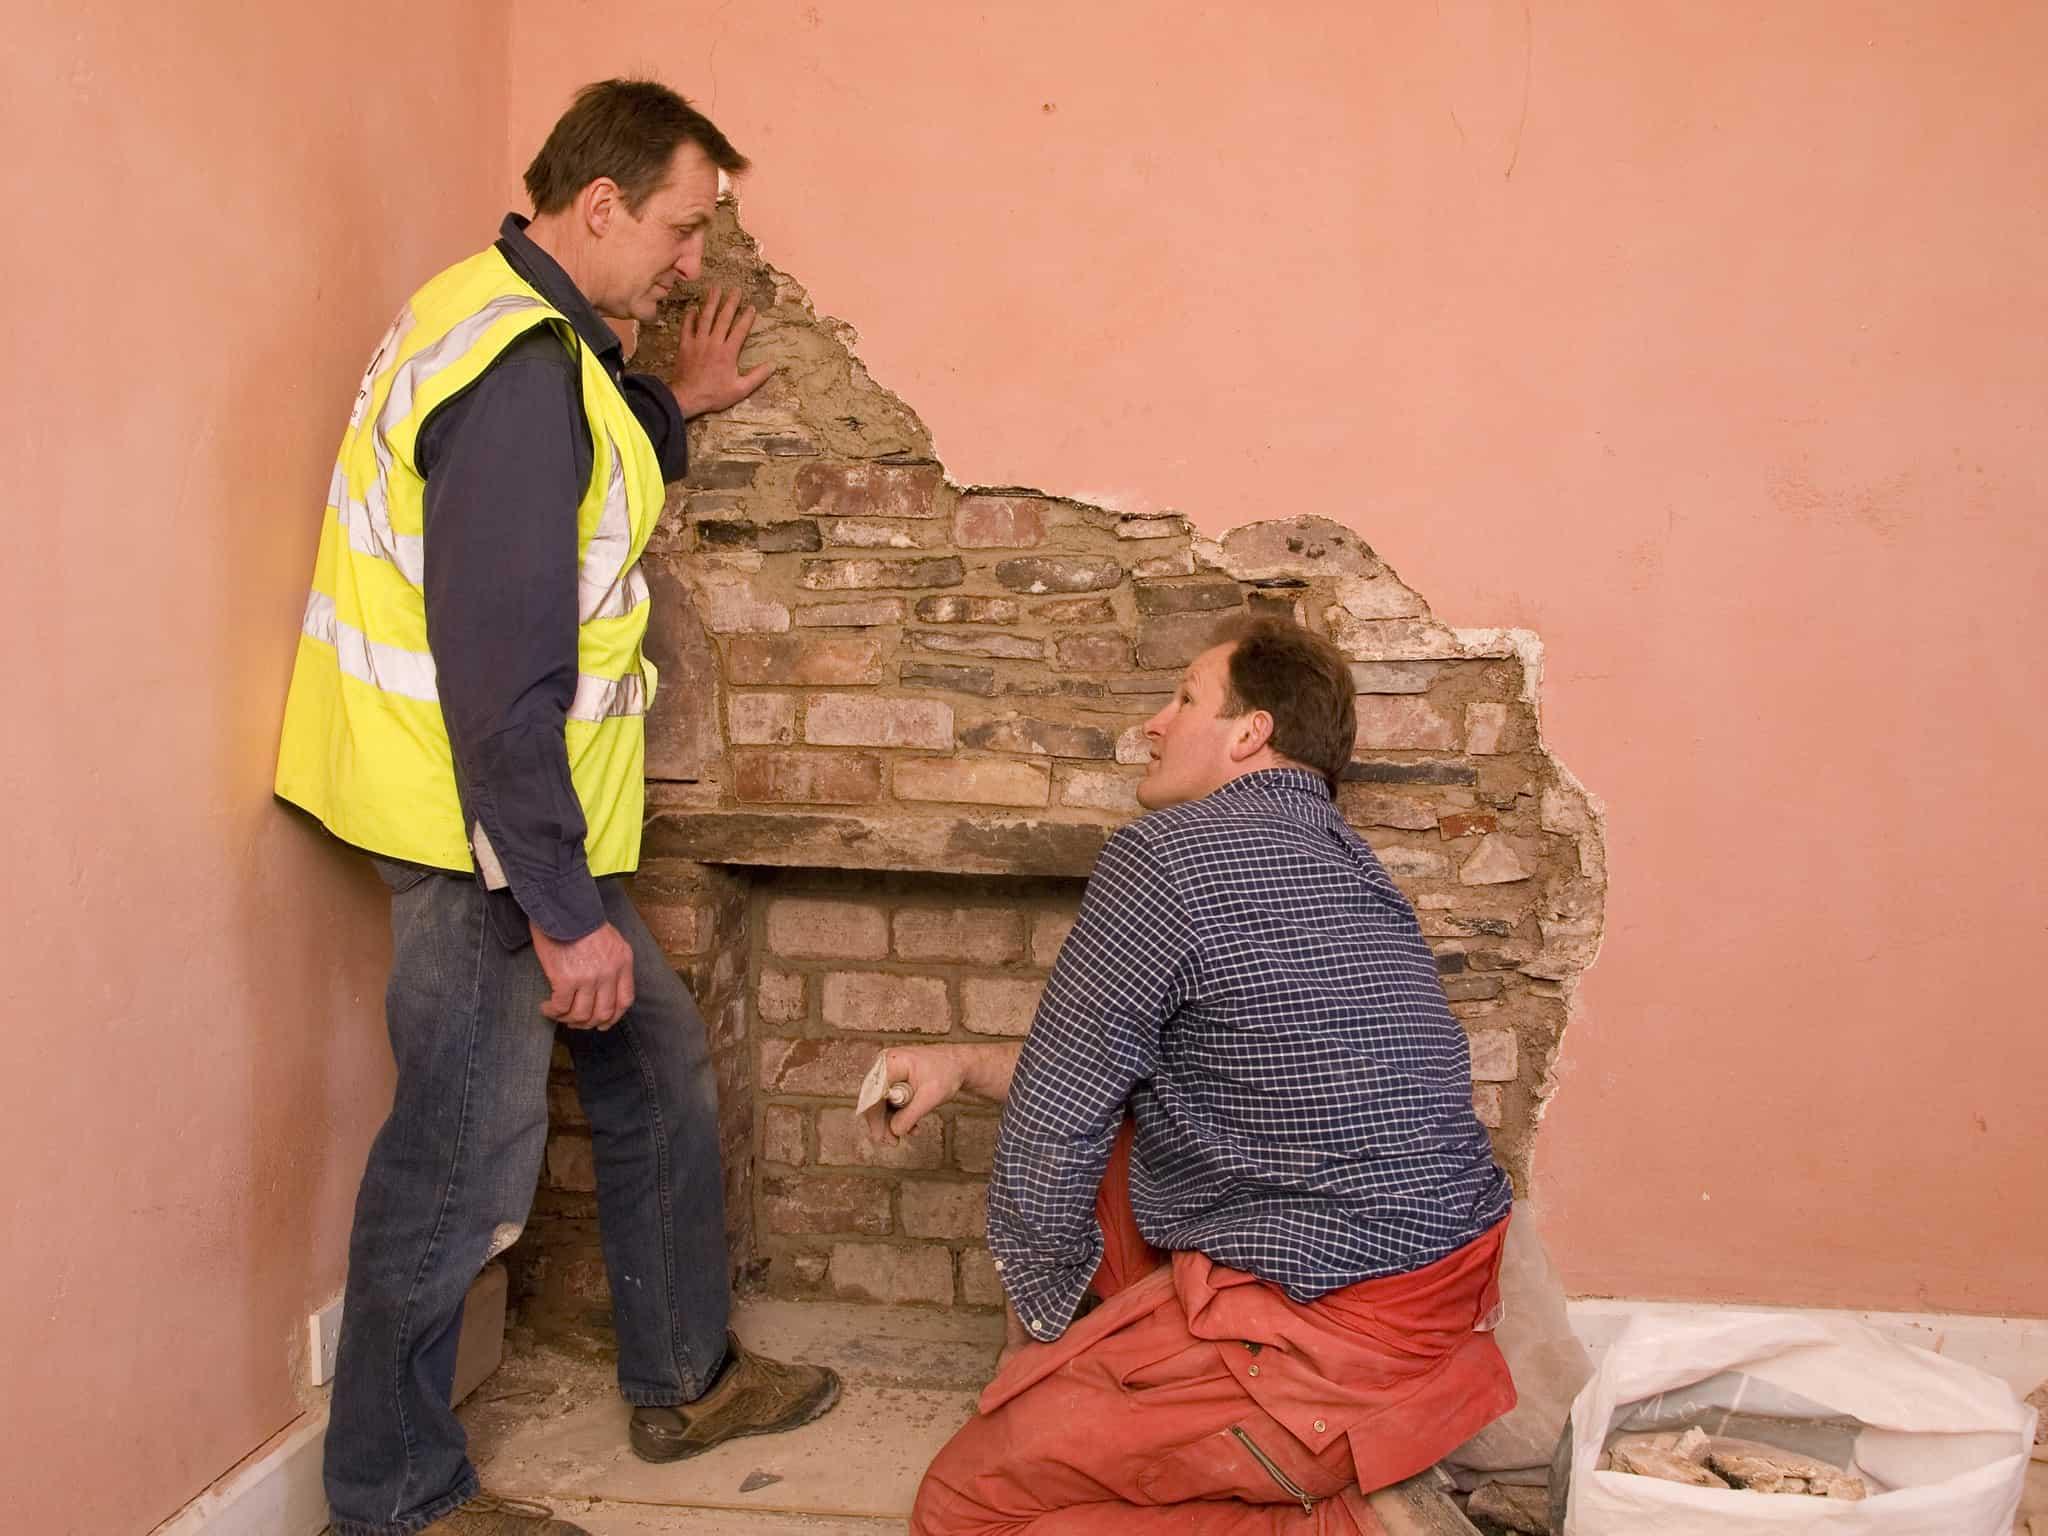 Two workmen look at exposed brickwork